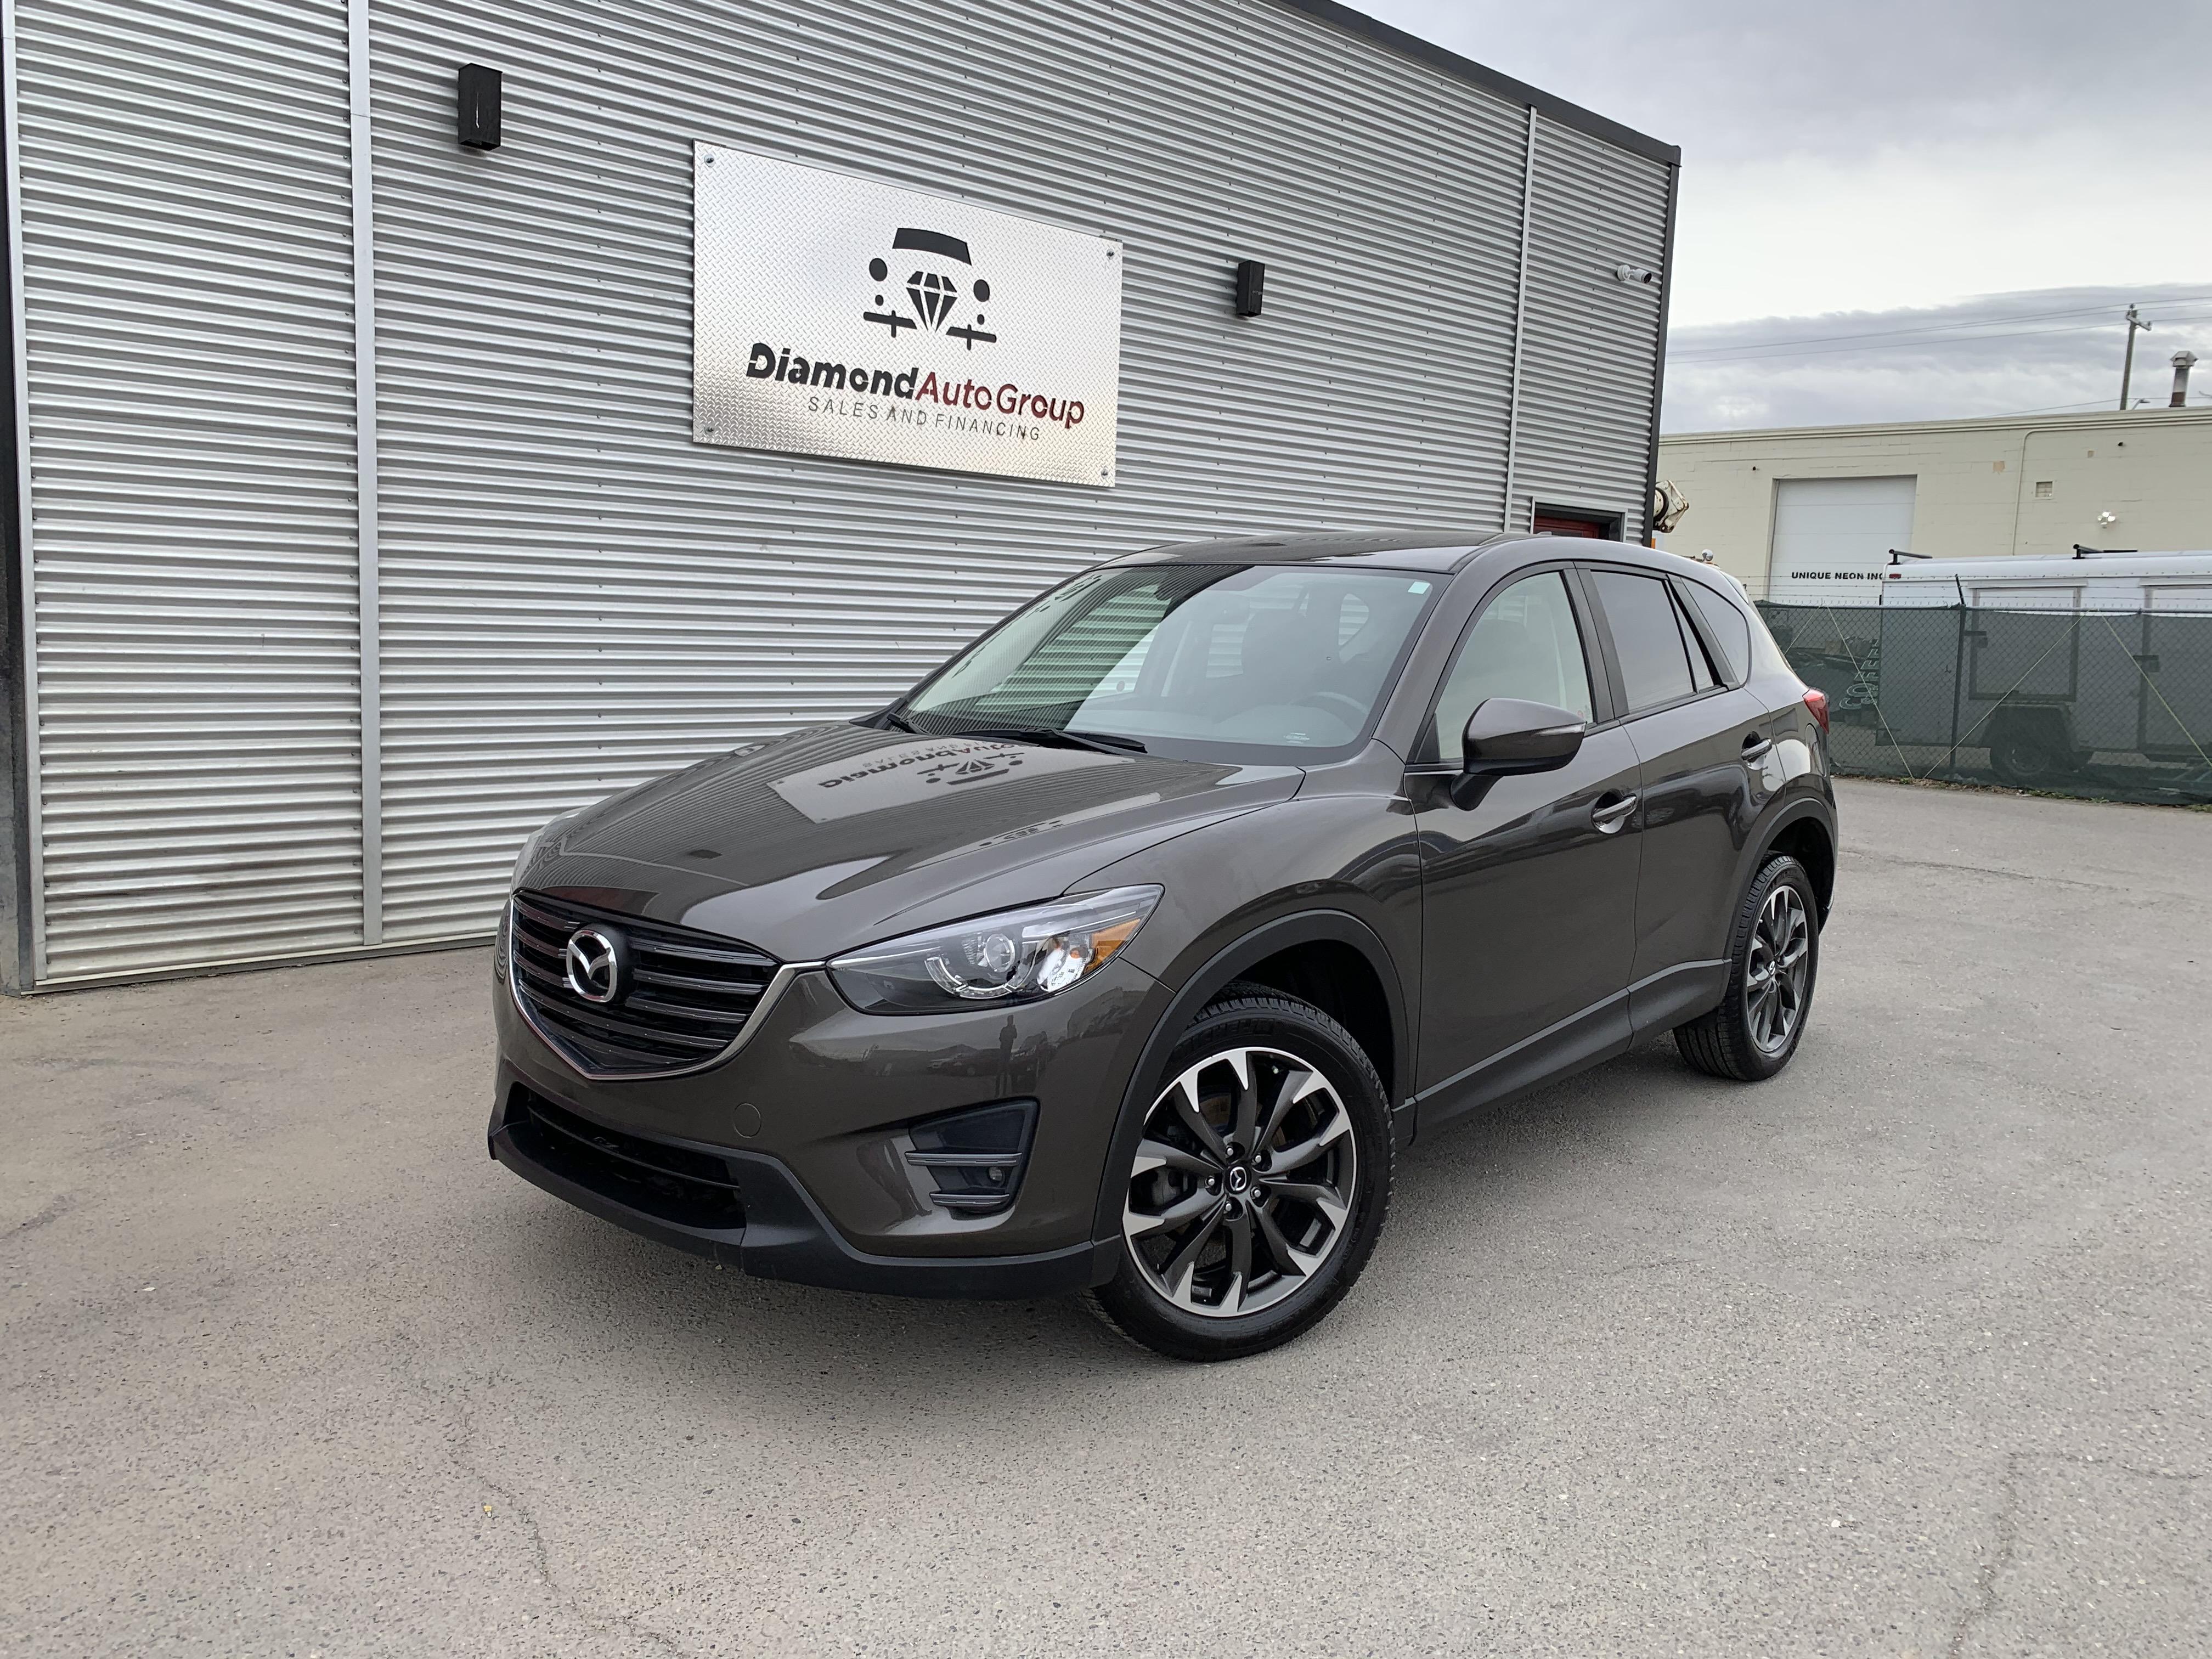 2016 Mazda CX-5 AWD [0]